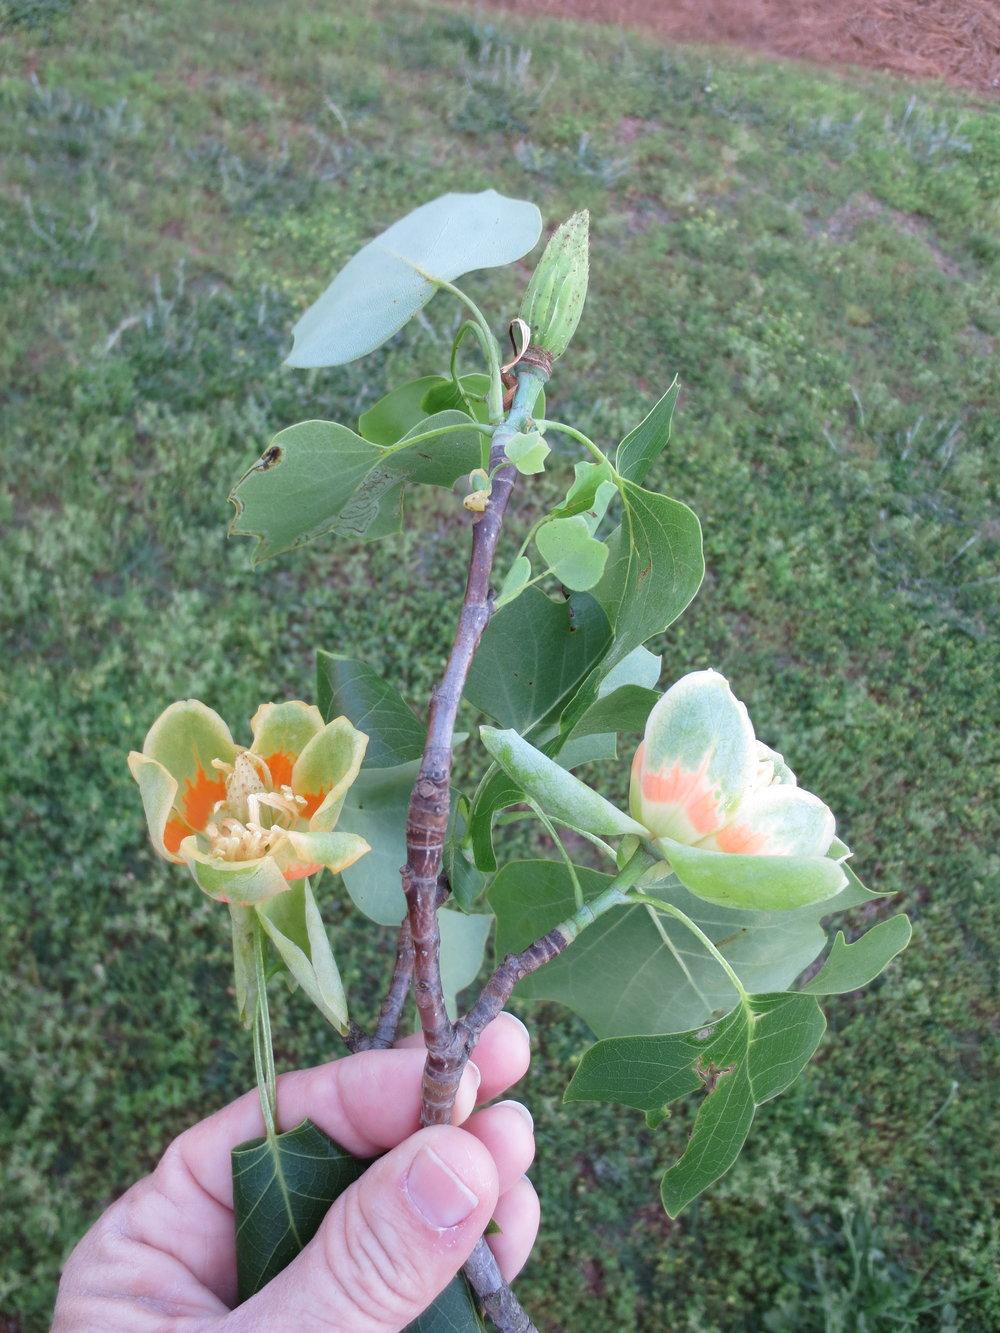 Flower of a Tulip Poplar